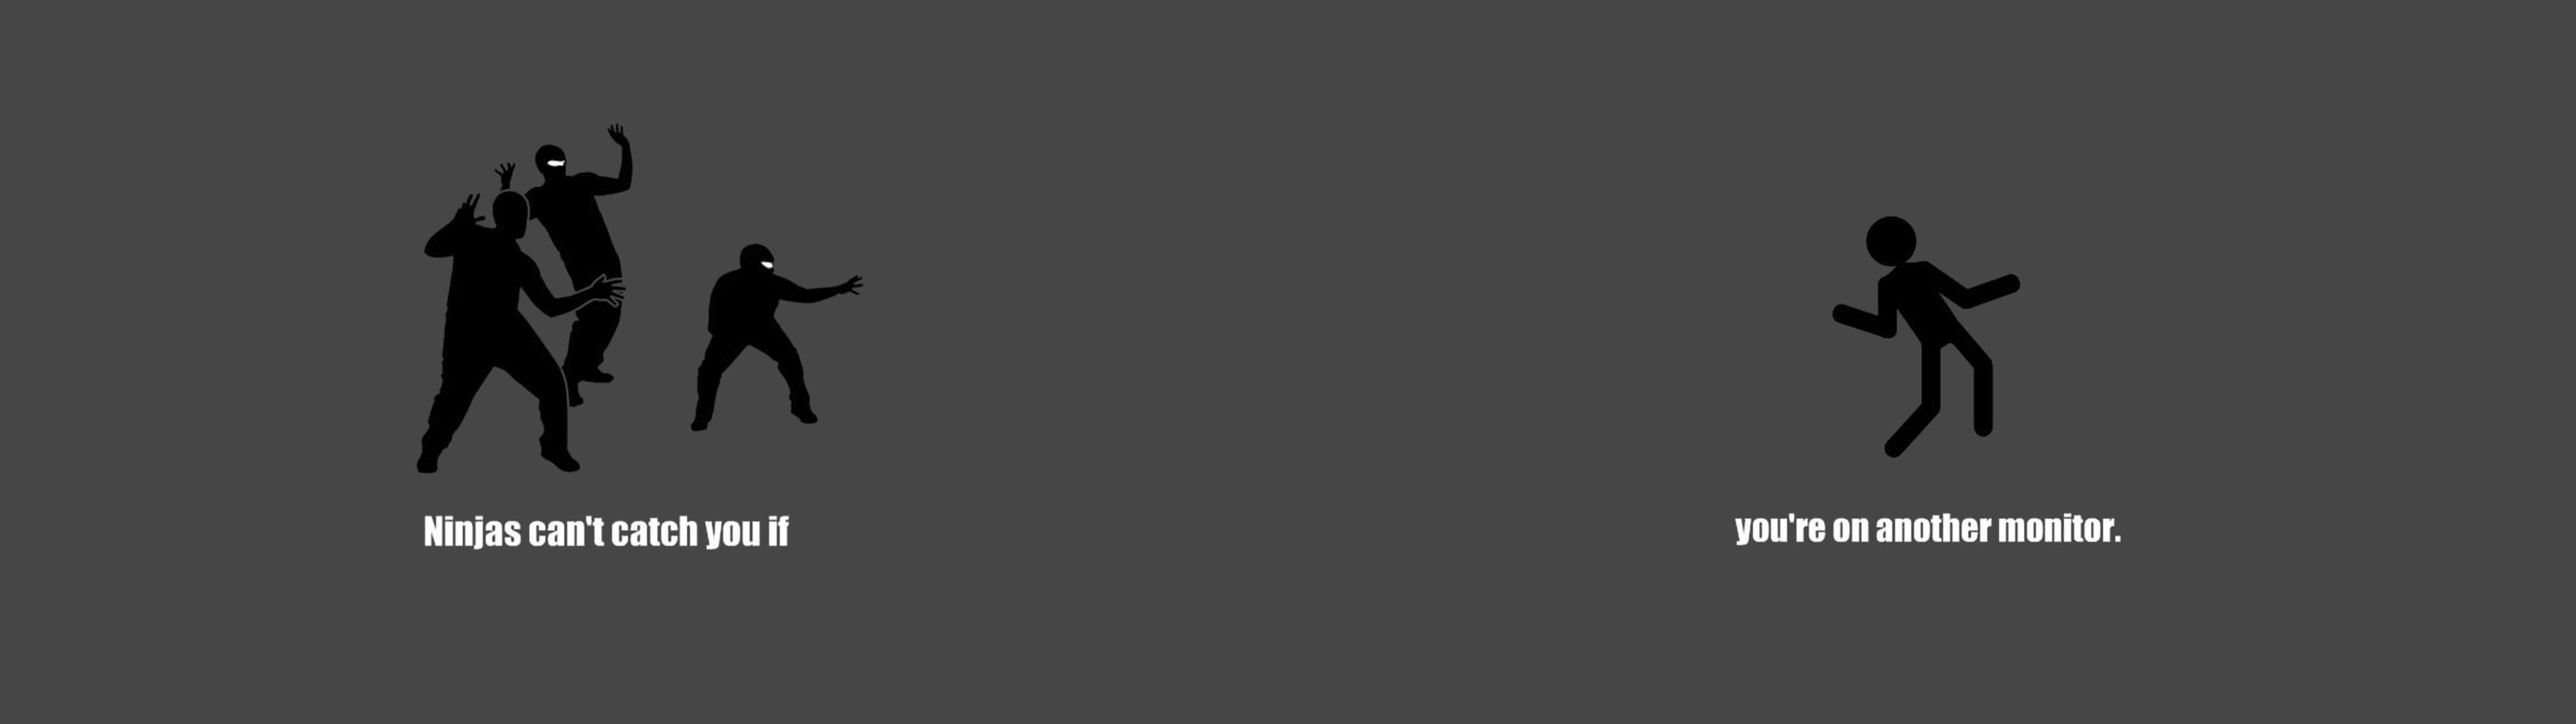 Pac Man Dual Monitor Wallpaper | Dual Monitor Wallpaper  | Pinterest | Wallpaper and Screen wallpaper